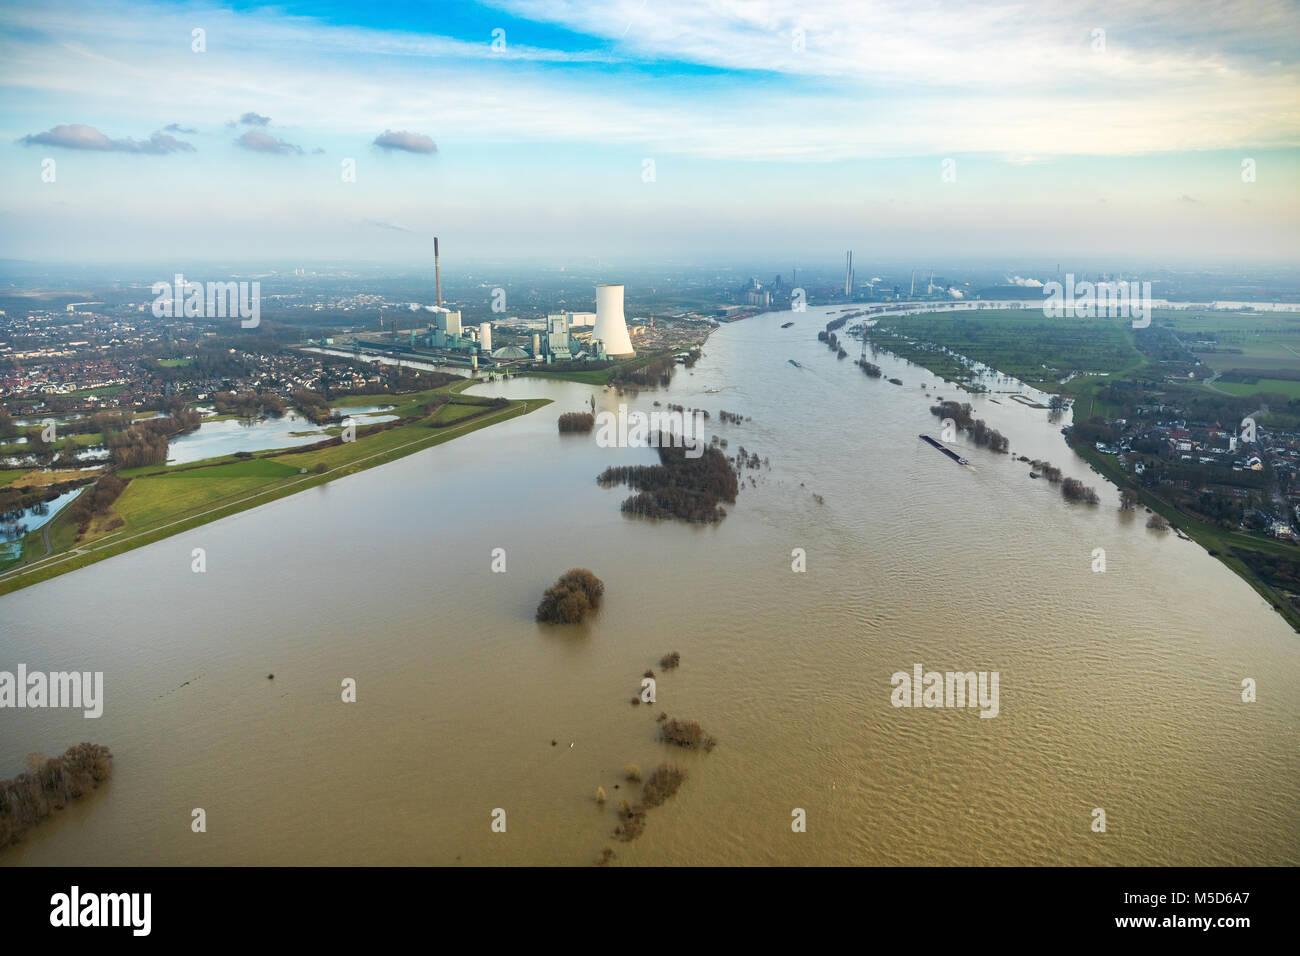 Flood on Rhine with Walsum power plant, near Duisburg, Ruhr Area, North Rhine-Westphalia, Germany Stock Photo